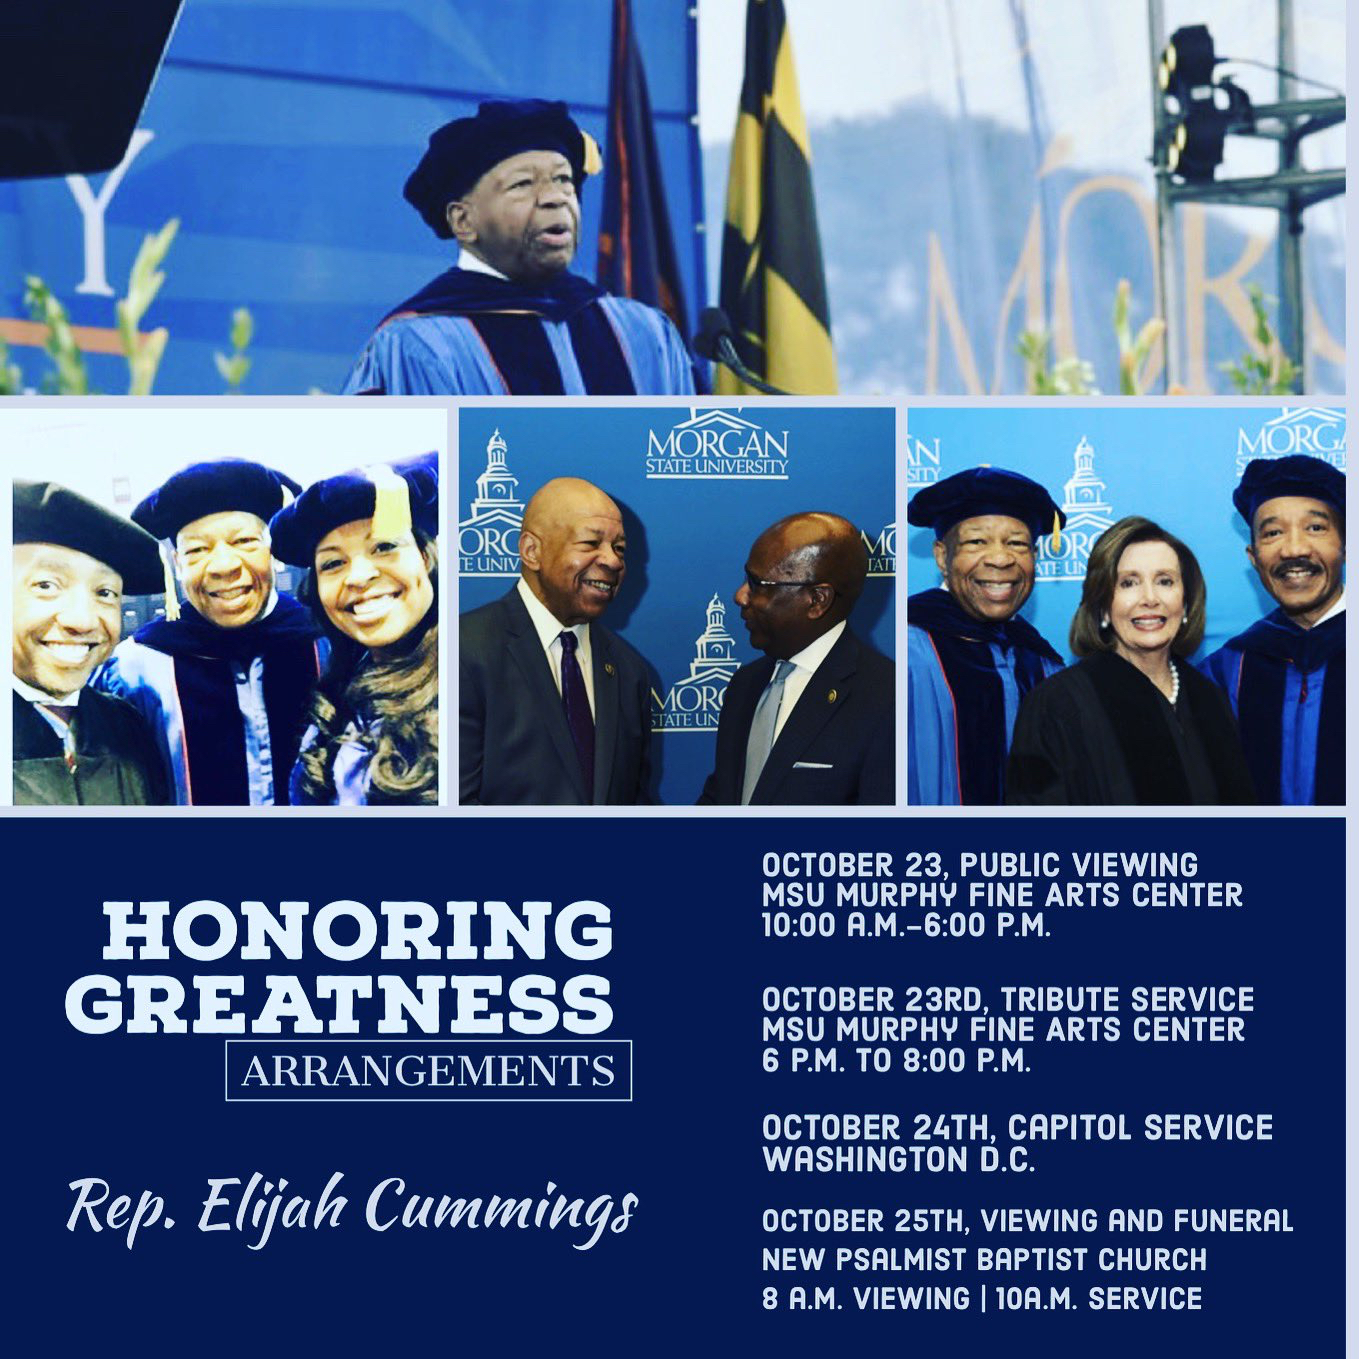 Funeral arrangements for the late Rep. Elijah E. Cummings.